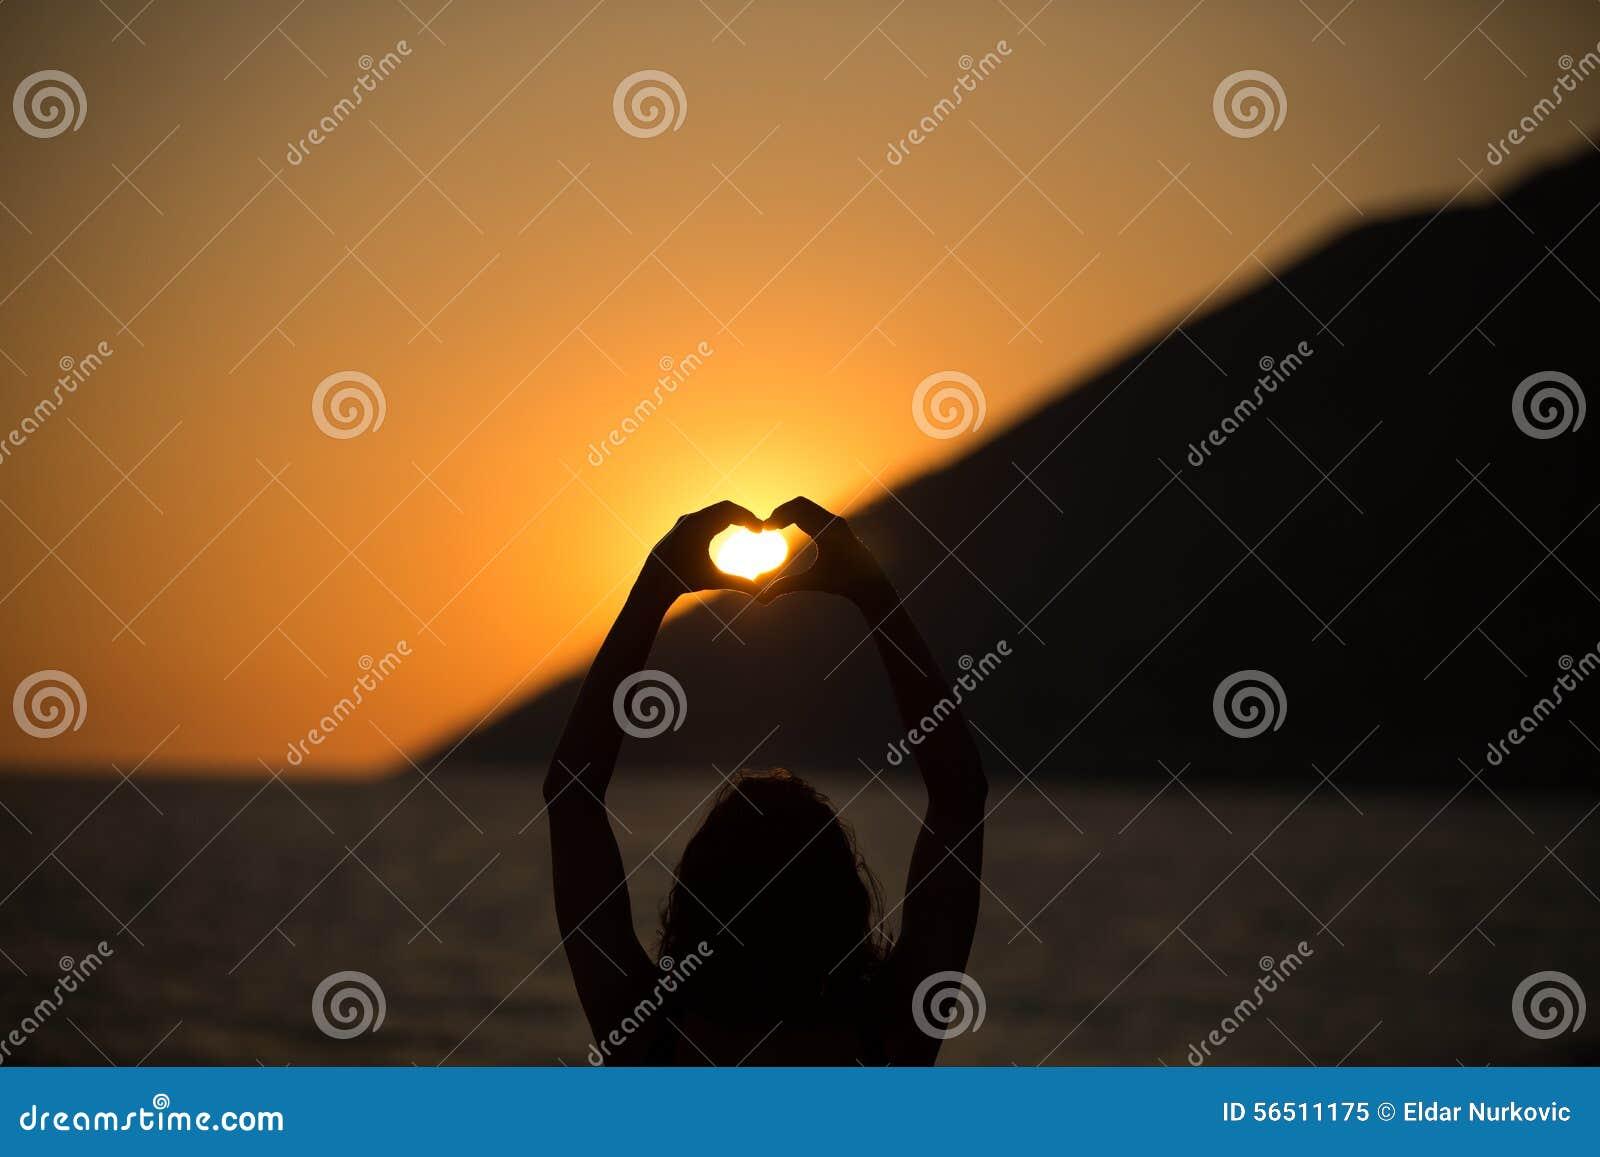 Free happy woman enjoying sunset..Embracing the golden sunshine glow of sunset,enjoying peace,serenity in nature.Vacation vitality